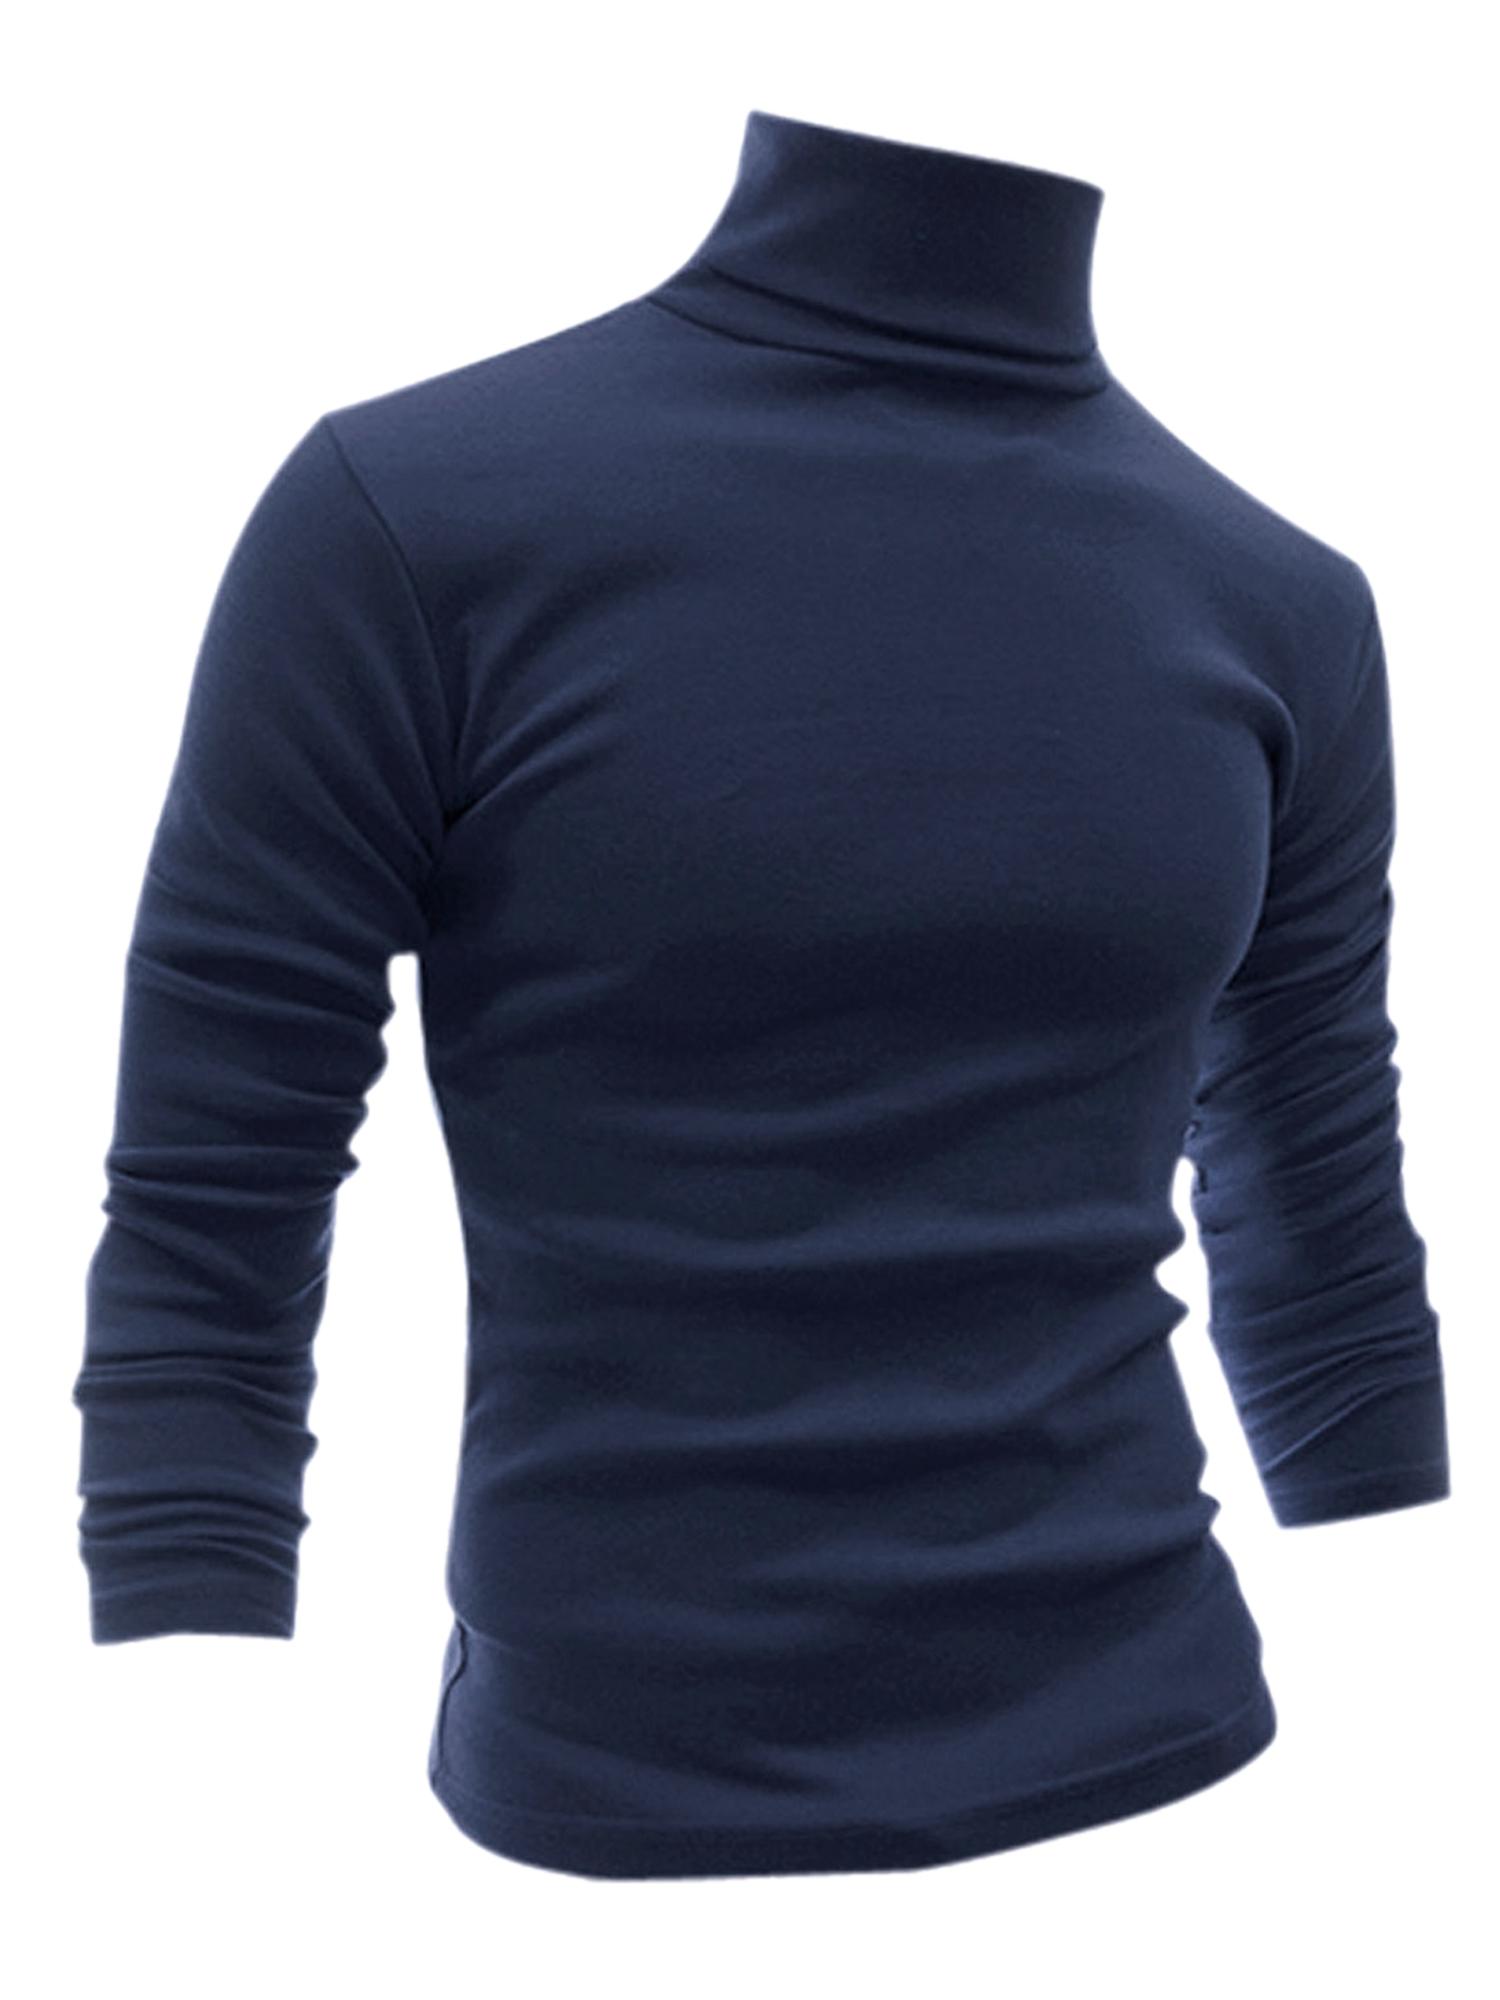 Men Slim Turtle Neck Design Soft Shirt Navy Blue S